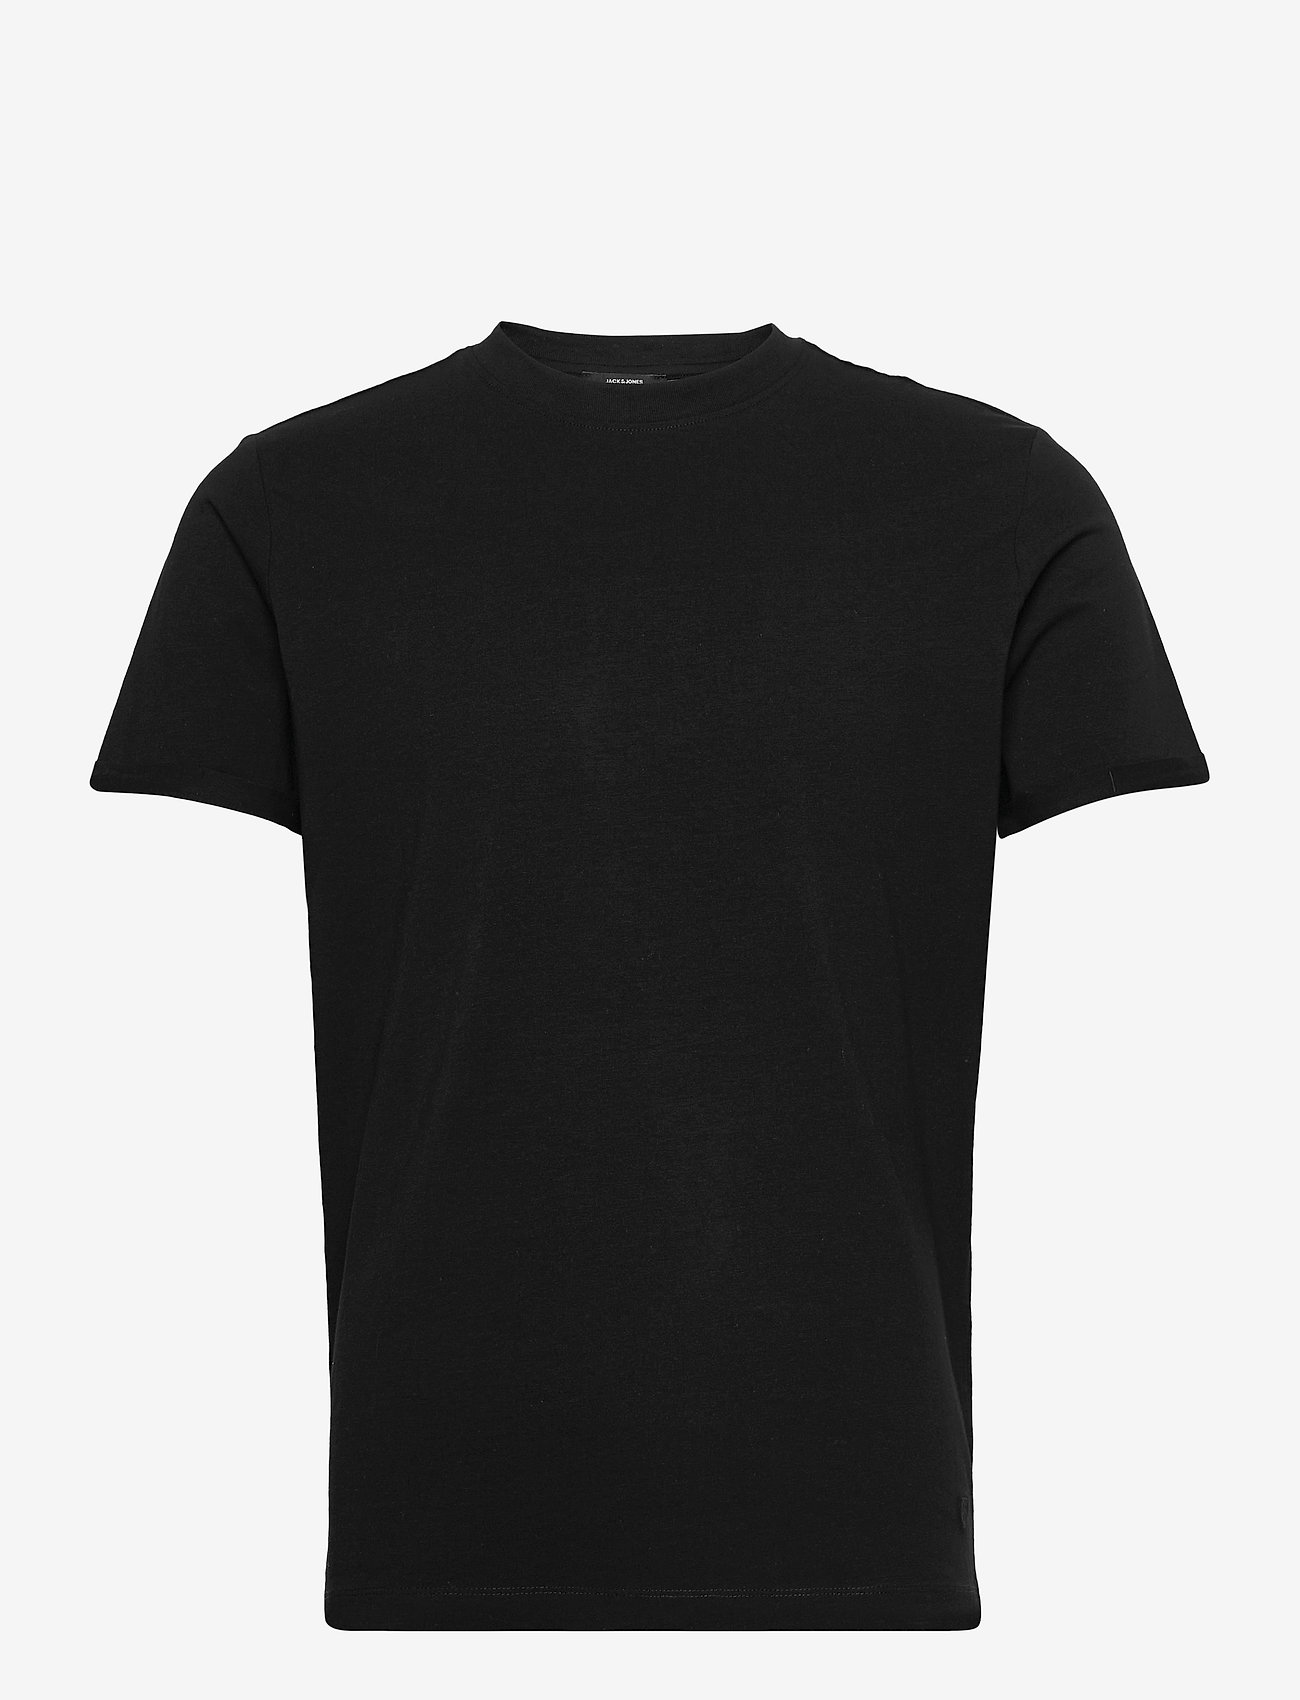 Jack & Jones - JPRBLALOGO SPRING TEE SS CREW NECK - basic t-shirts - black - 0